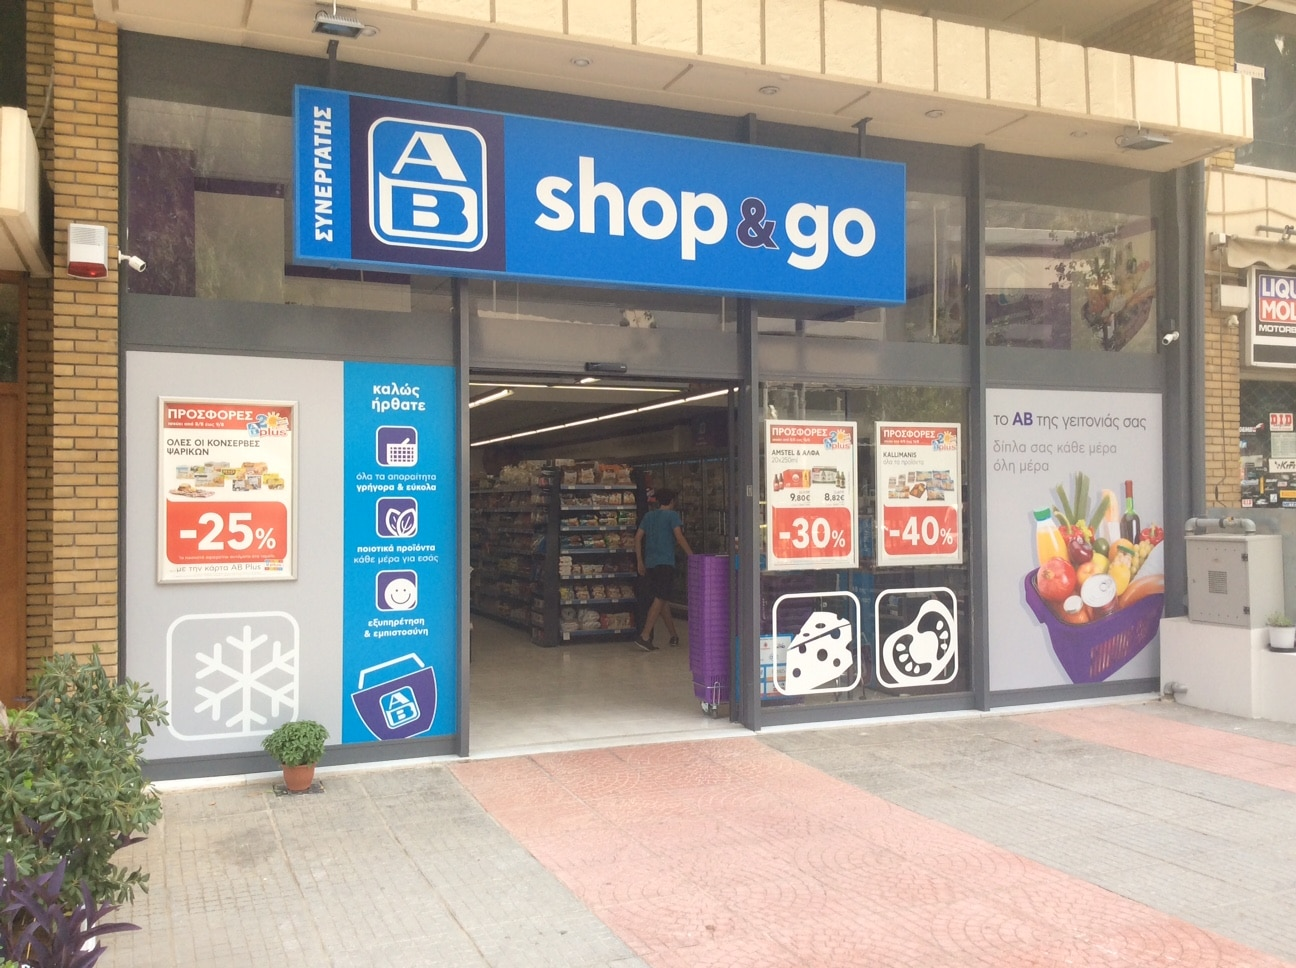 VITRINA AB Shop & Go